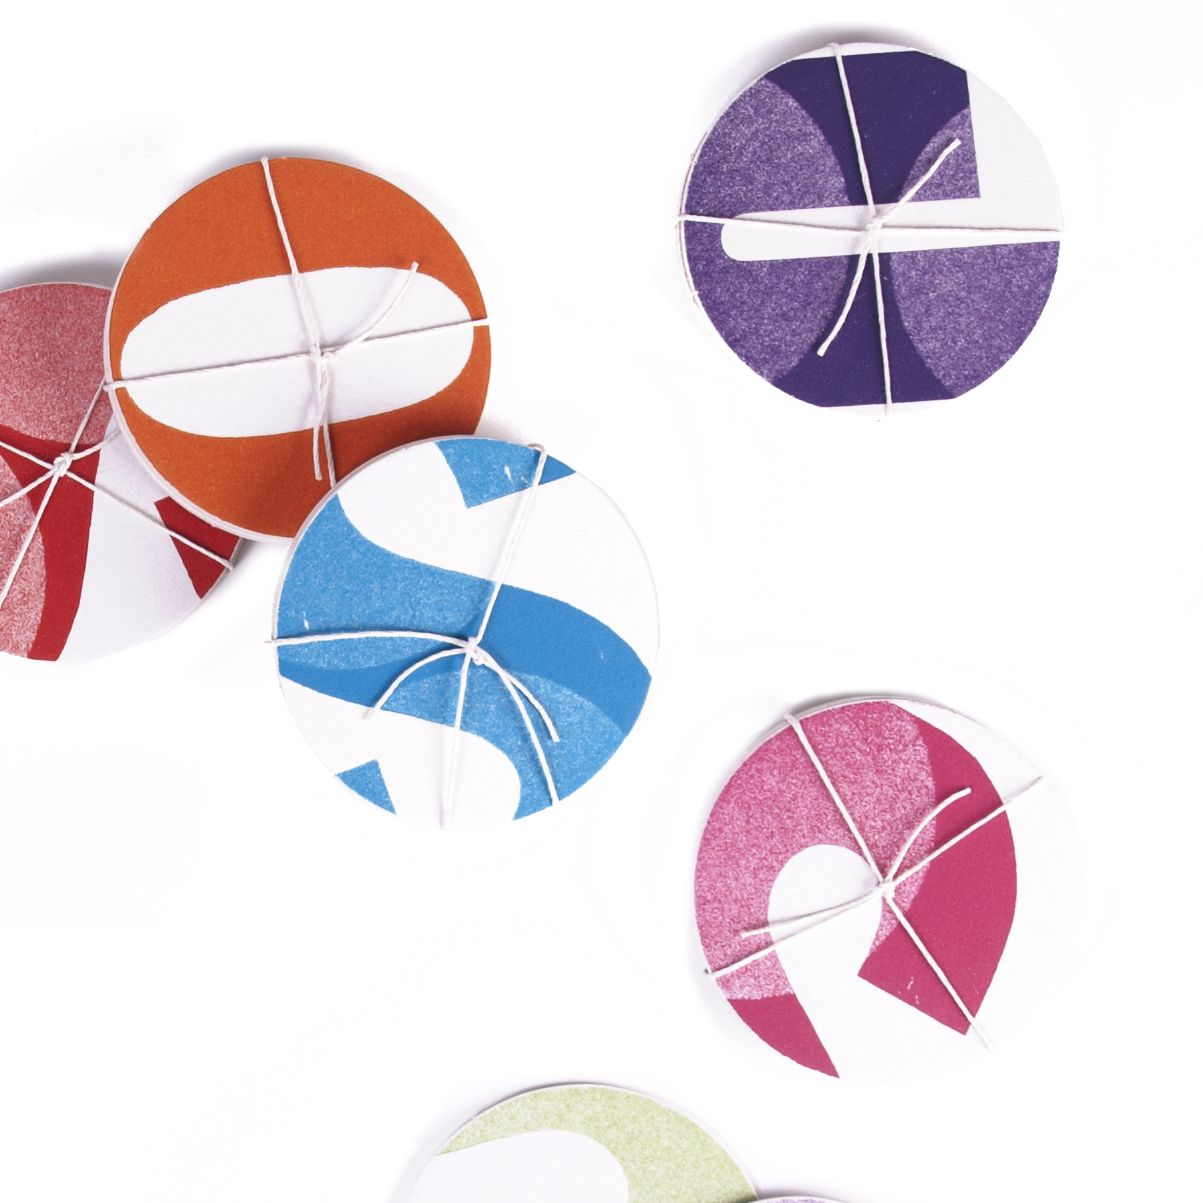 Letterpress handmade coasters <3